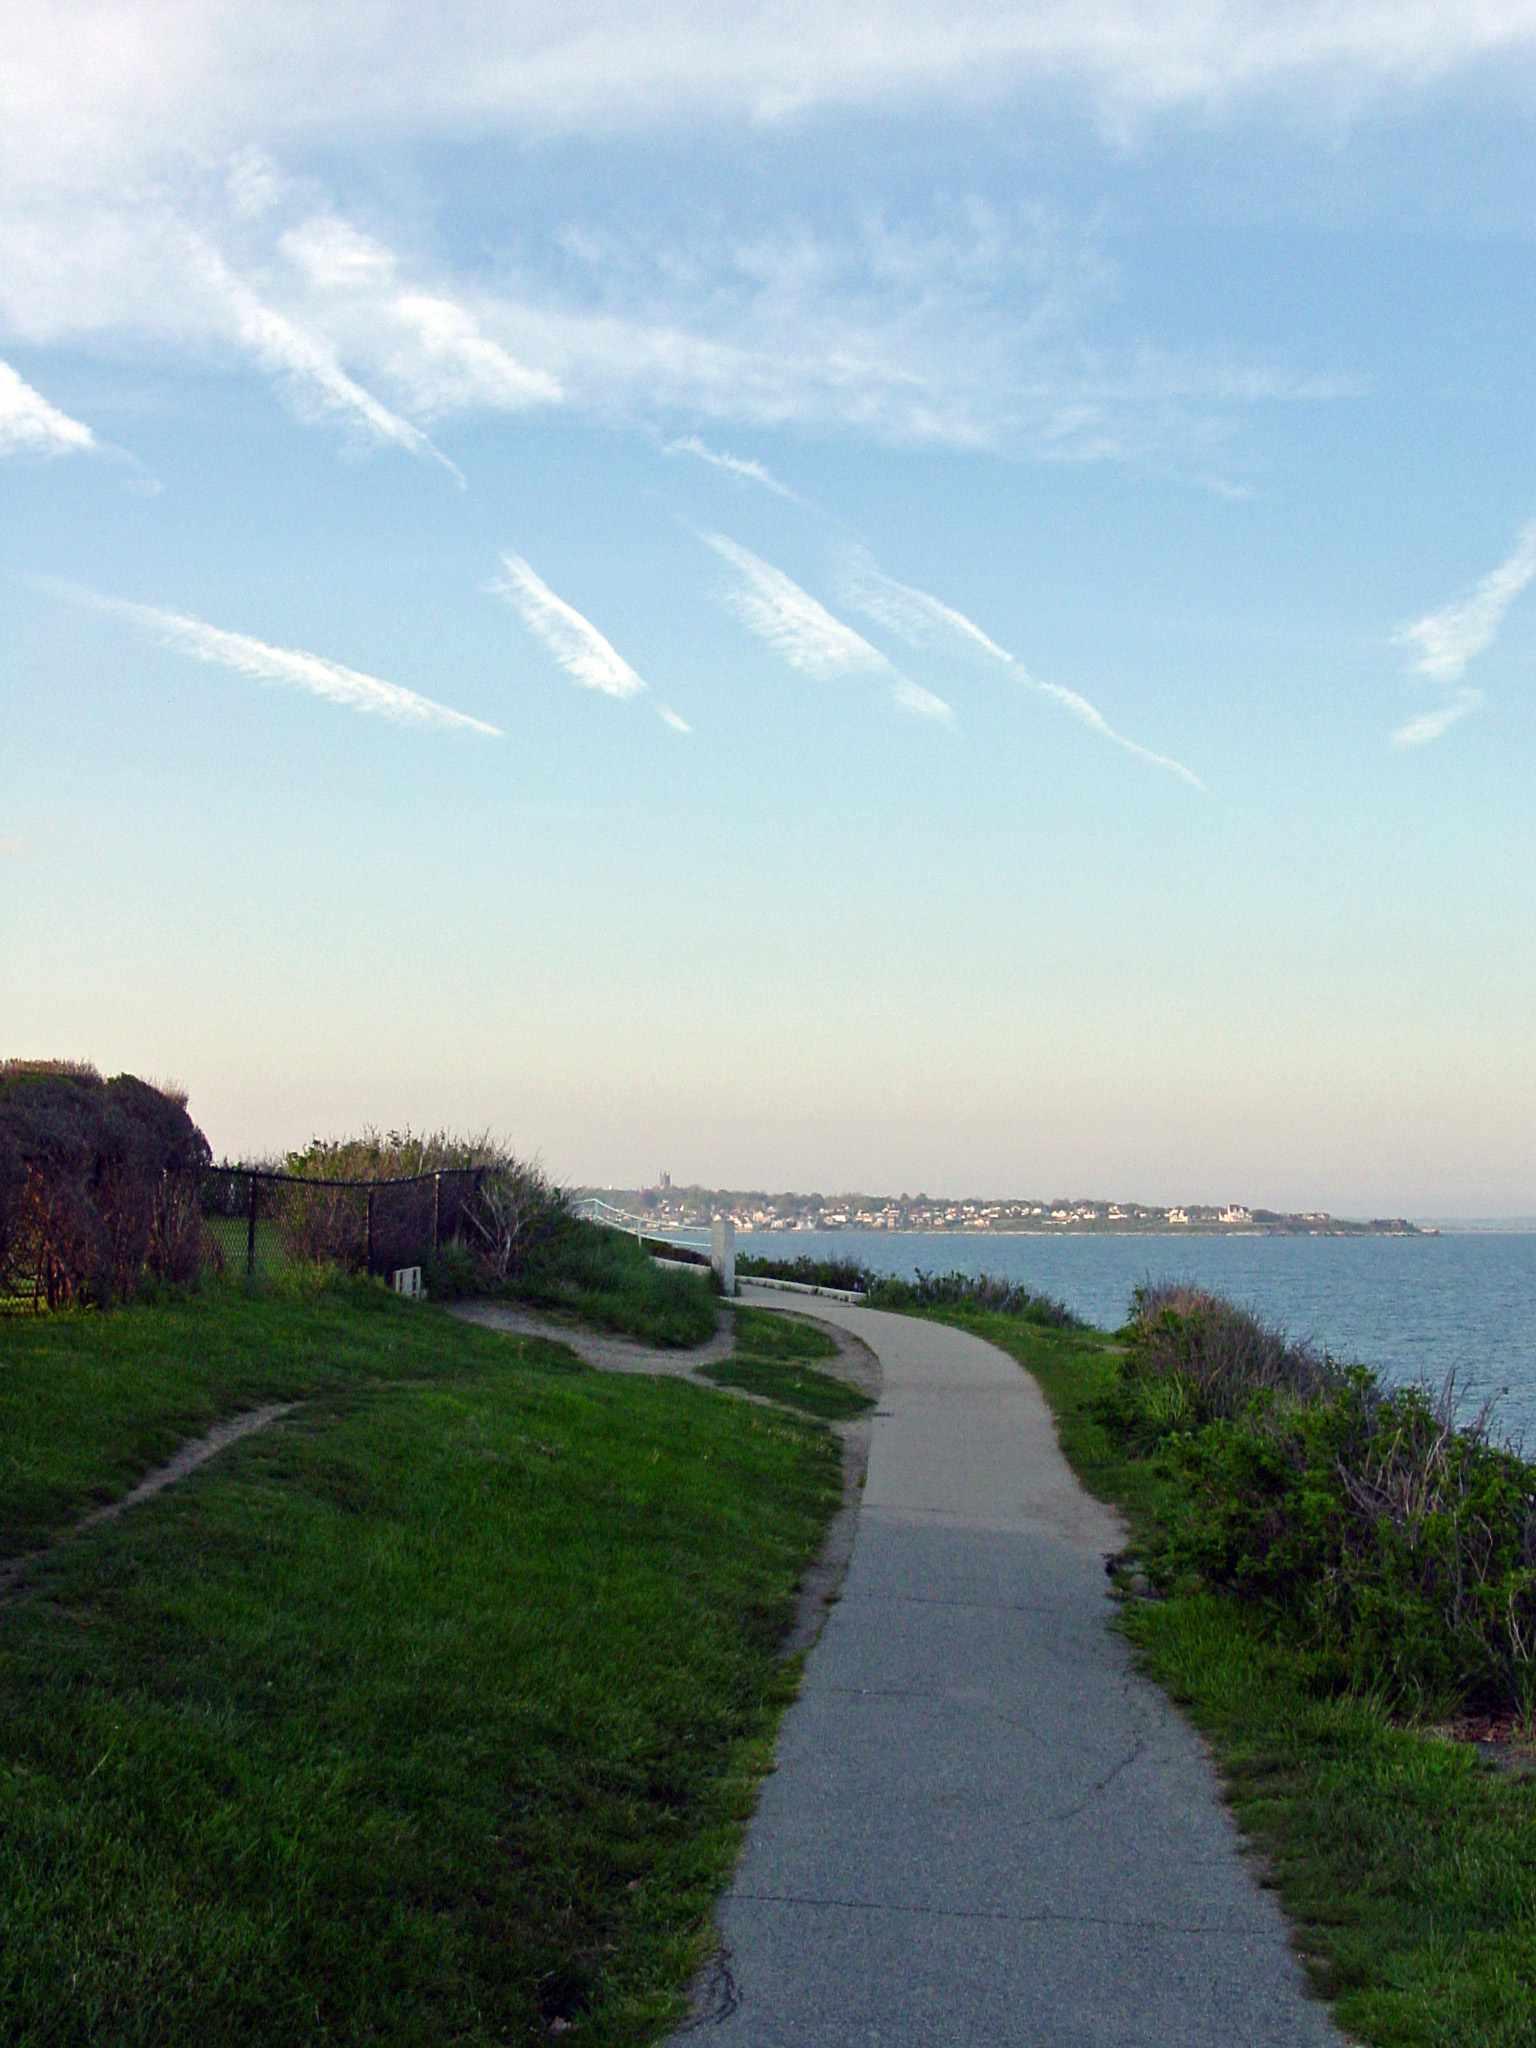 Cliff Walk in Newport Rhode Island Evening Photo